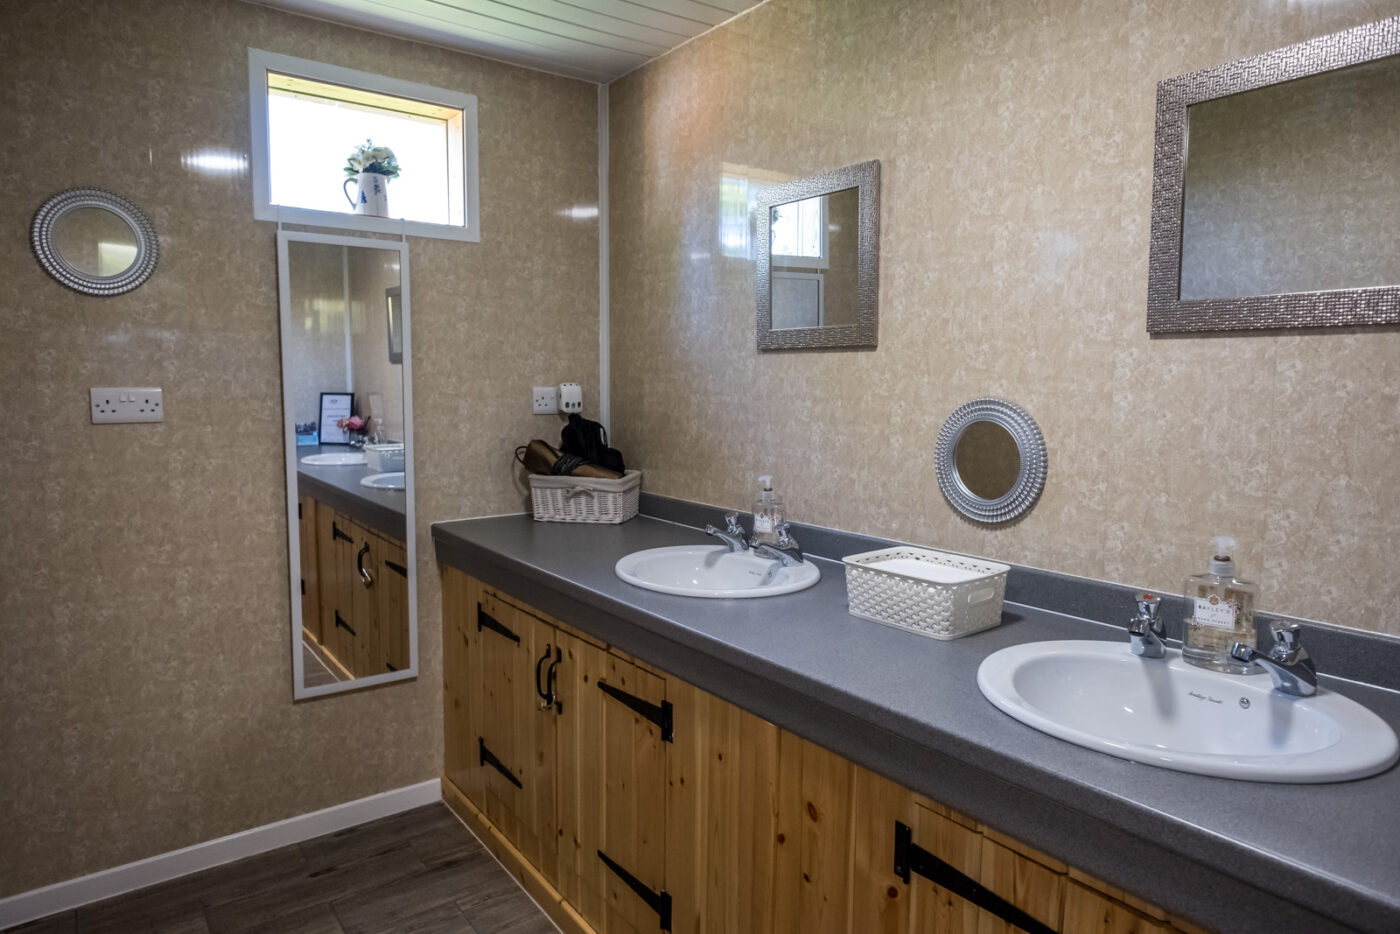 washroom facility